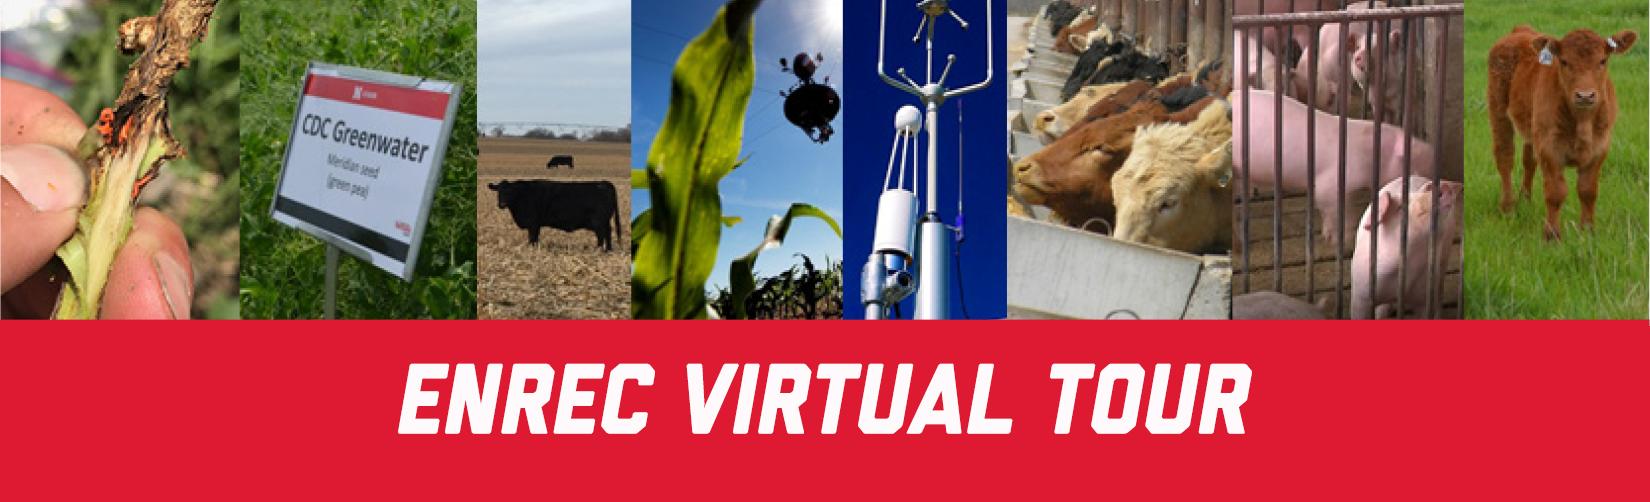 ENREC Virtual Tour